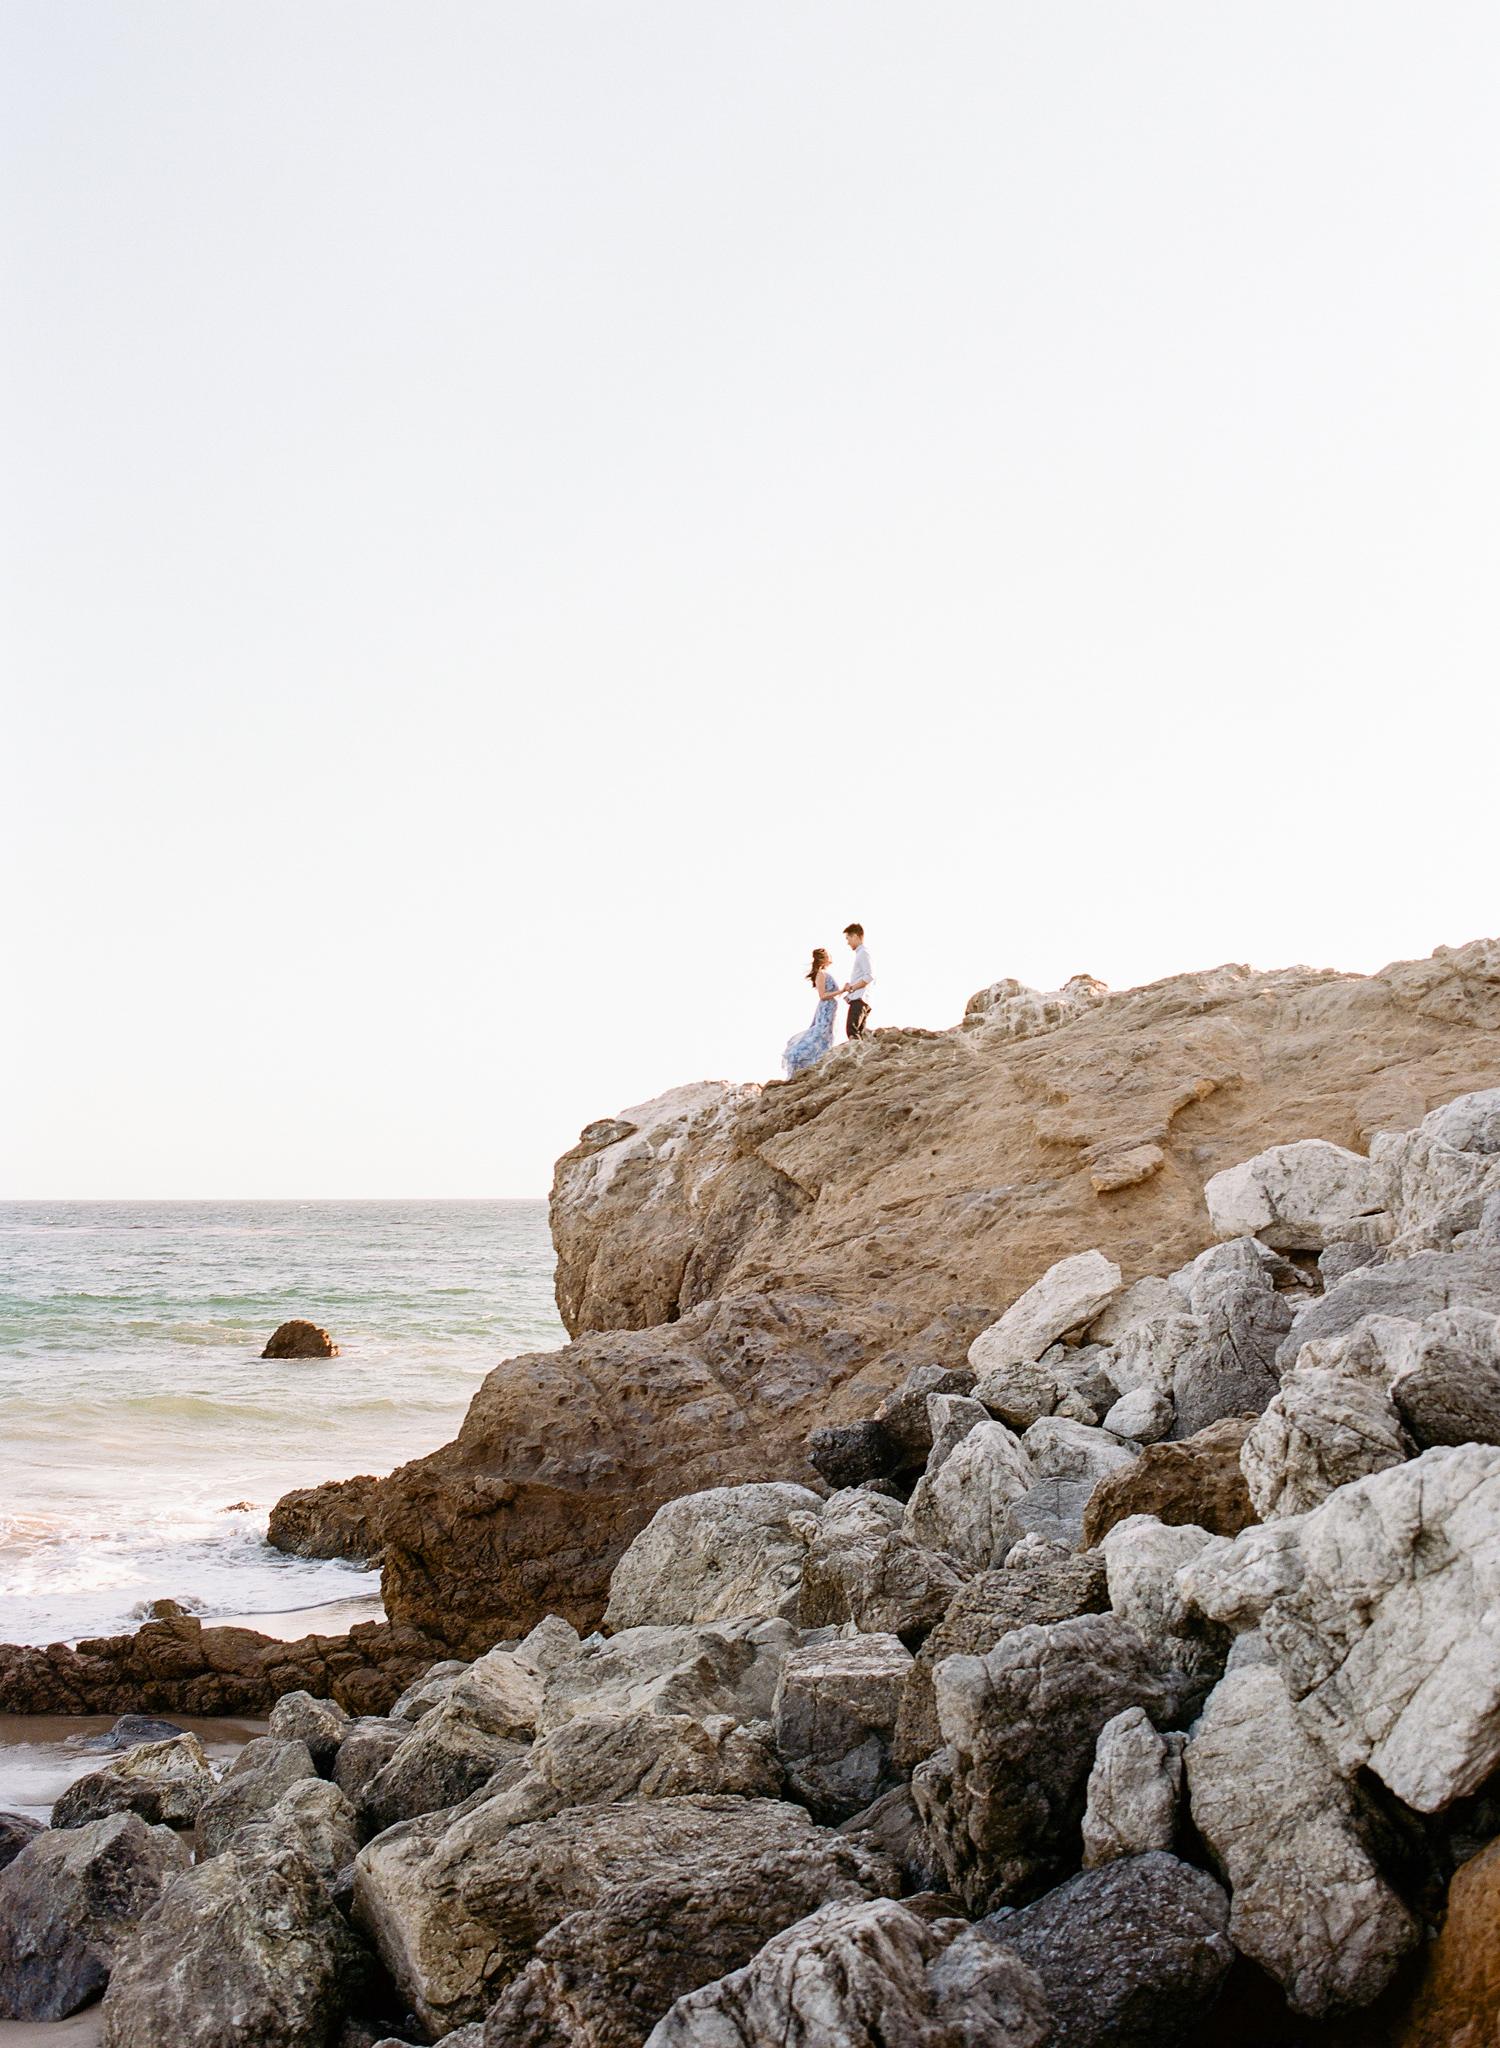 034-Jen-Wojcik-Photography-San-Diego-Wedding-Photographer.jpg